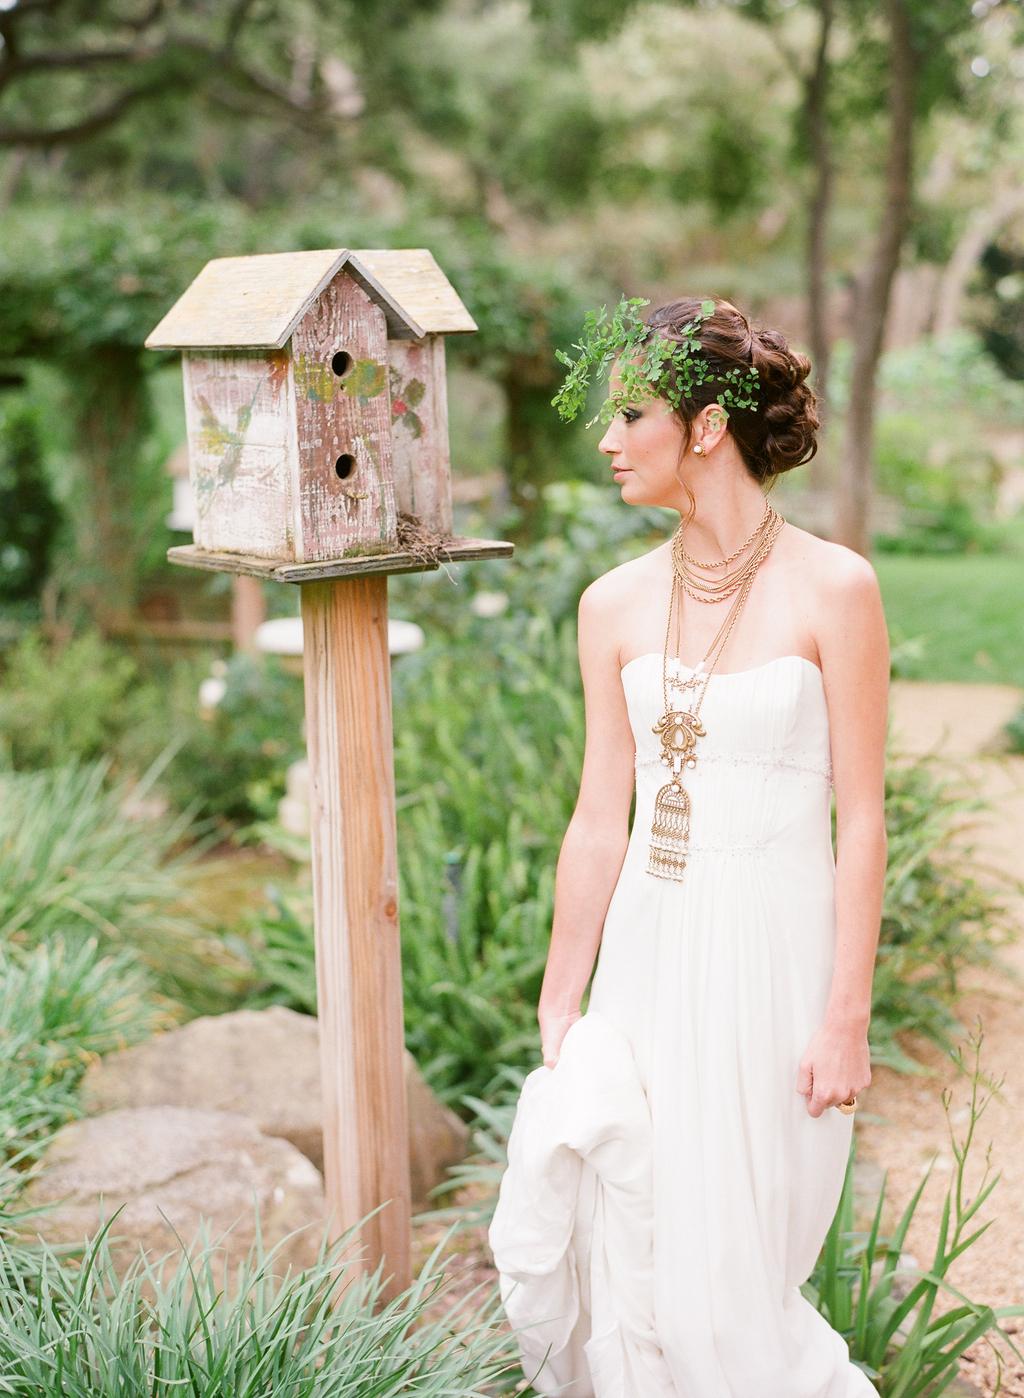 Styled-wedding-santa-barbara-chic-beaux-arts-photographie-italian-bohemian-wedding-bride-wedding-dress-white-flowers-bouquet-070.full